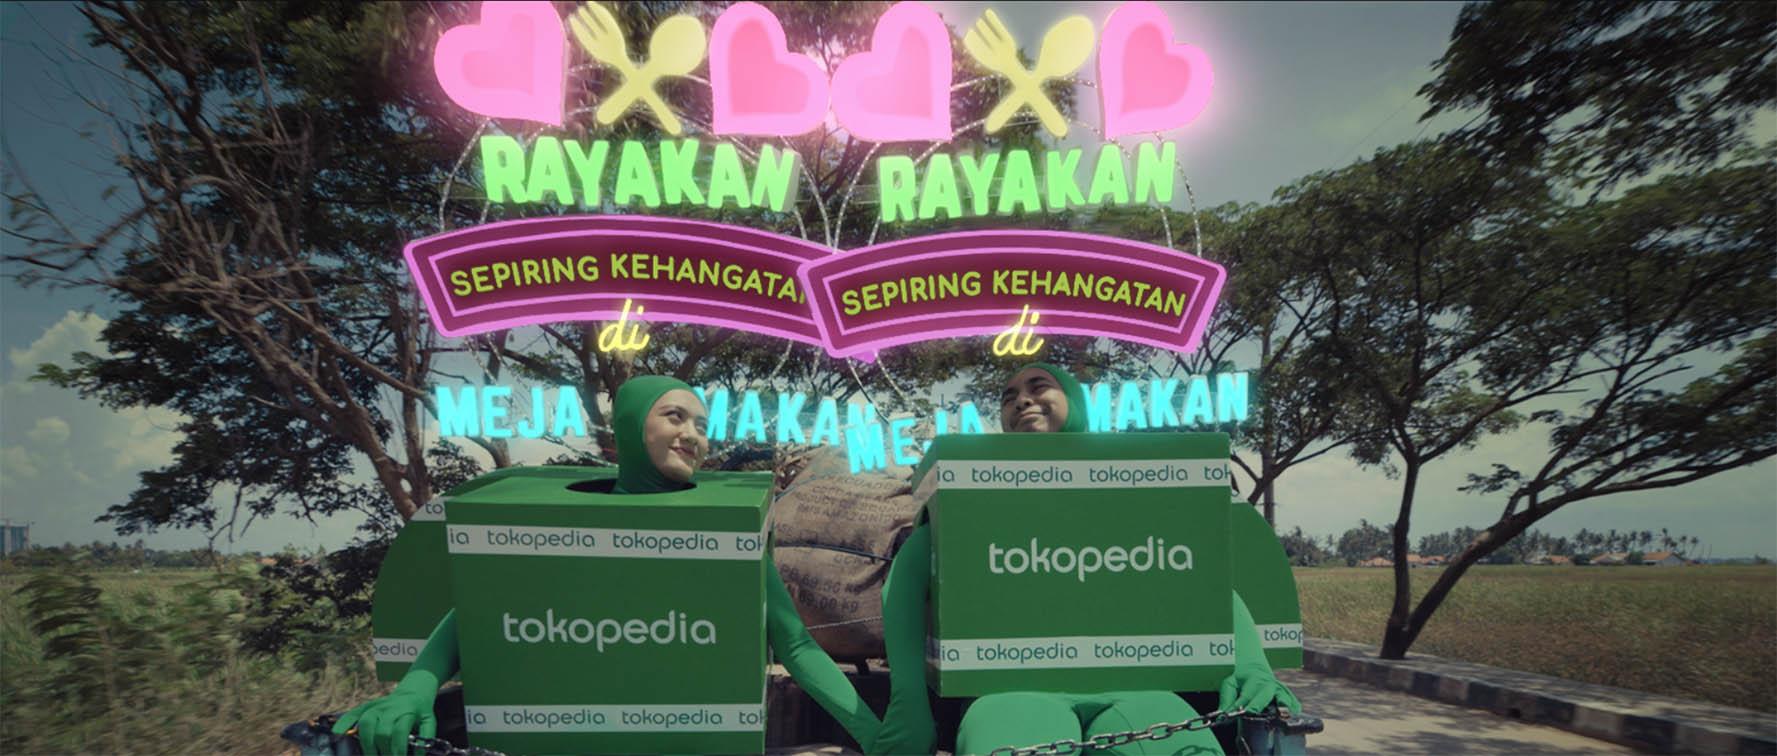 Flock Creative Network Jakarta releases new Tokopedia Ramadan film produced by Directors Think Tank